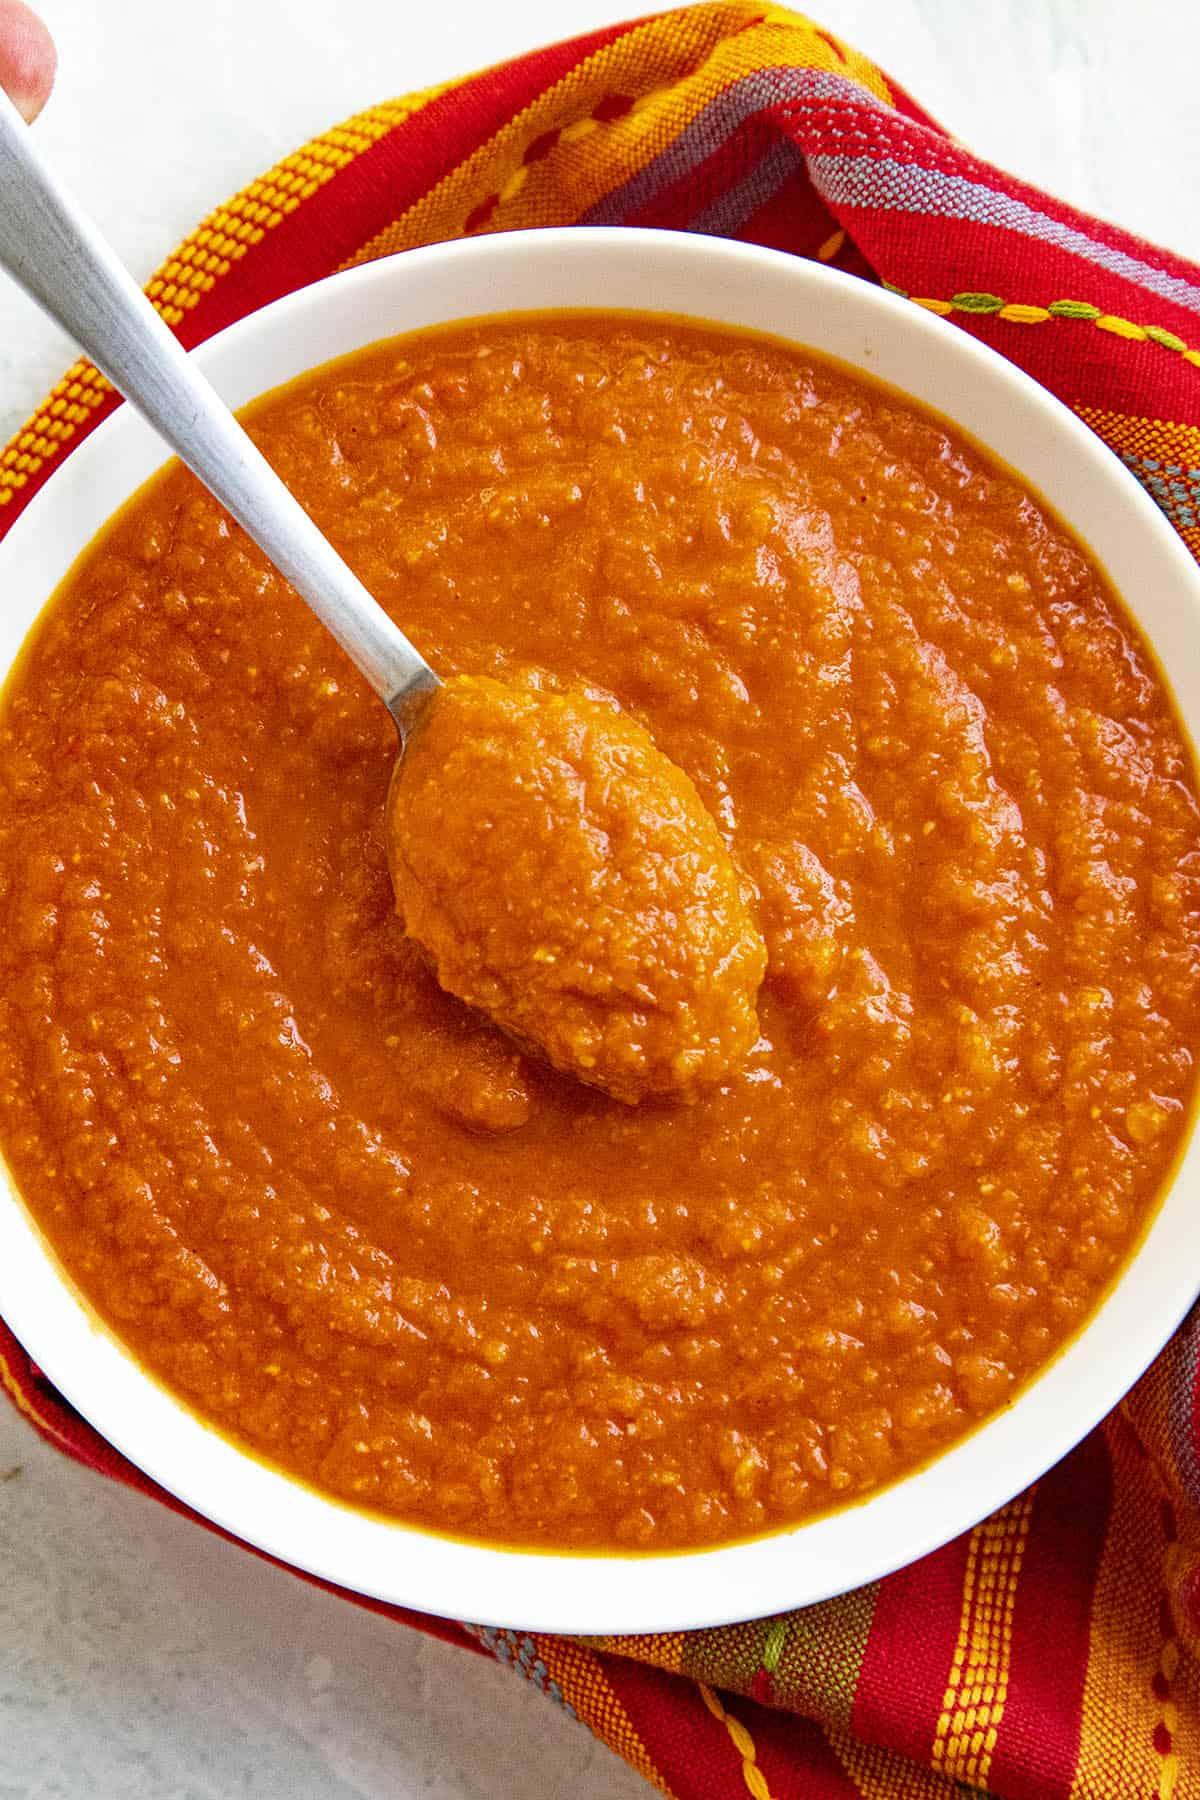 Bravas Sauce on a spoon